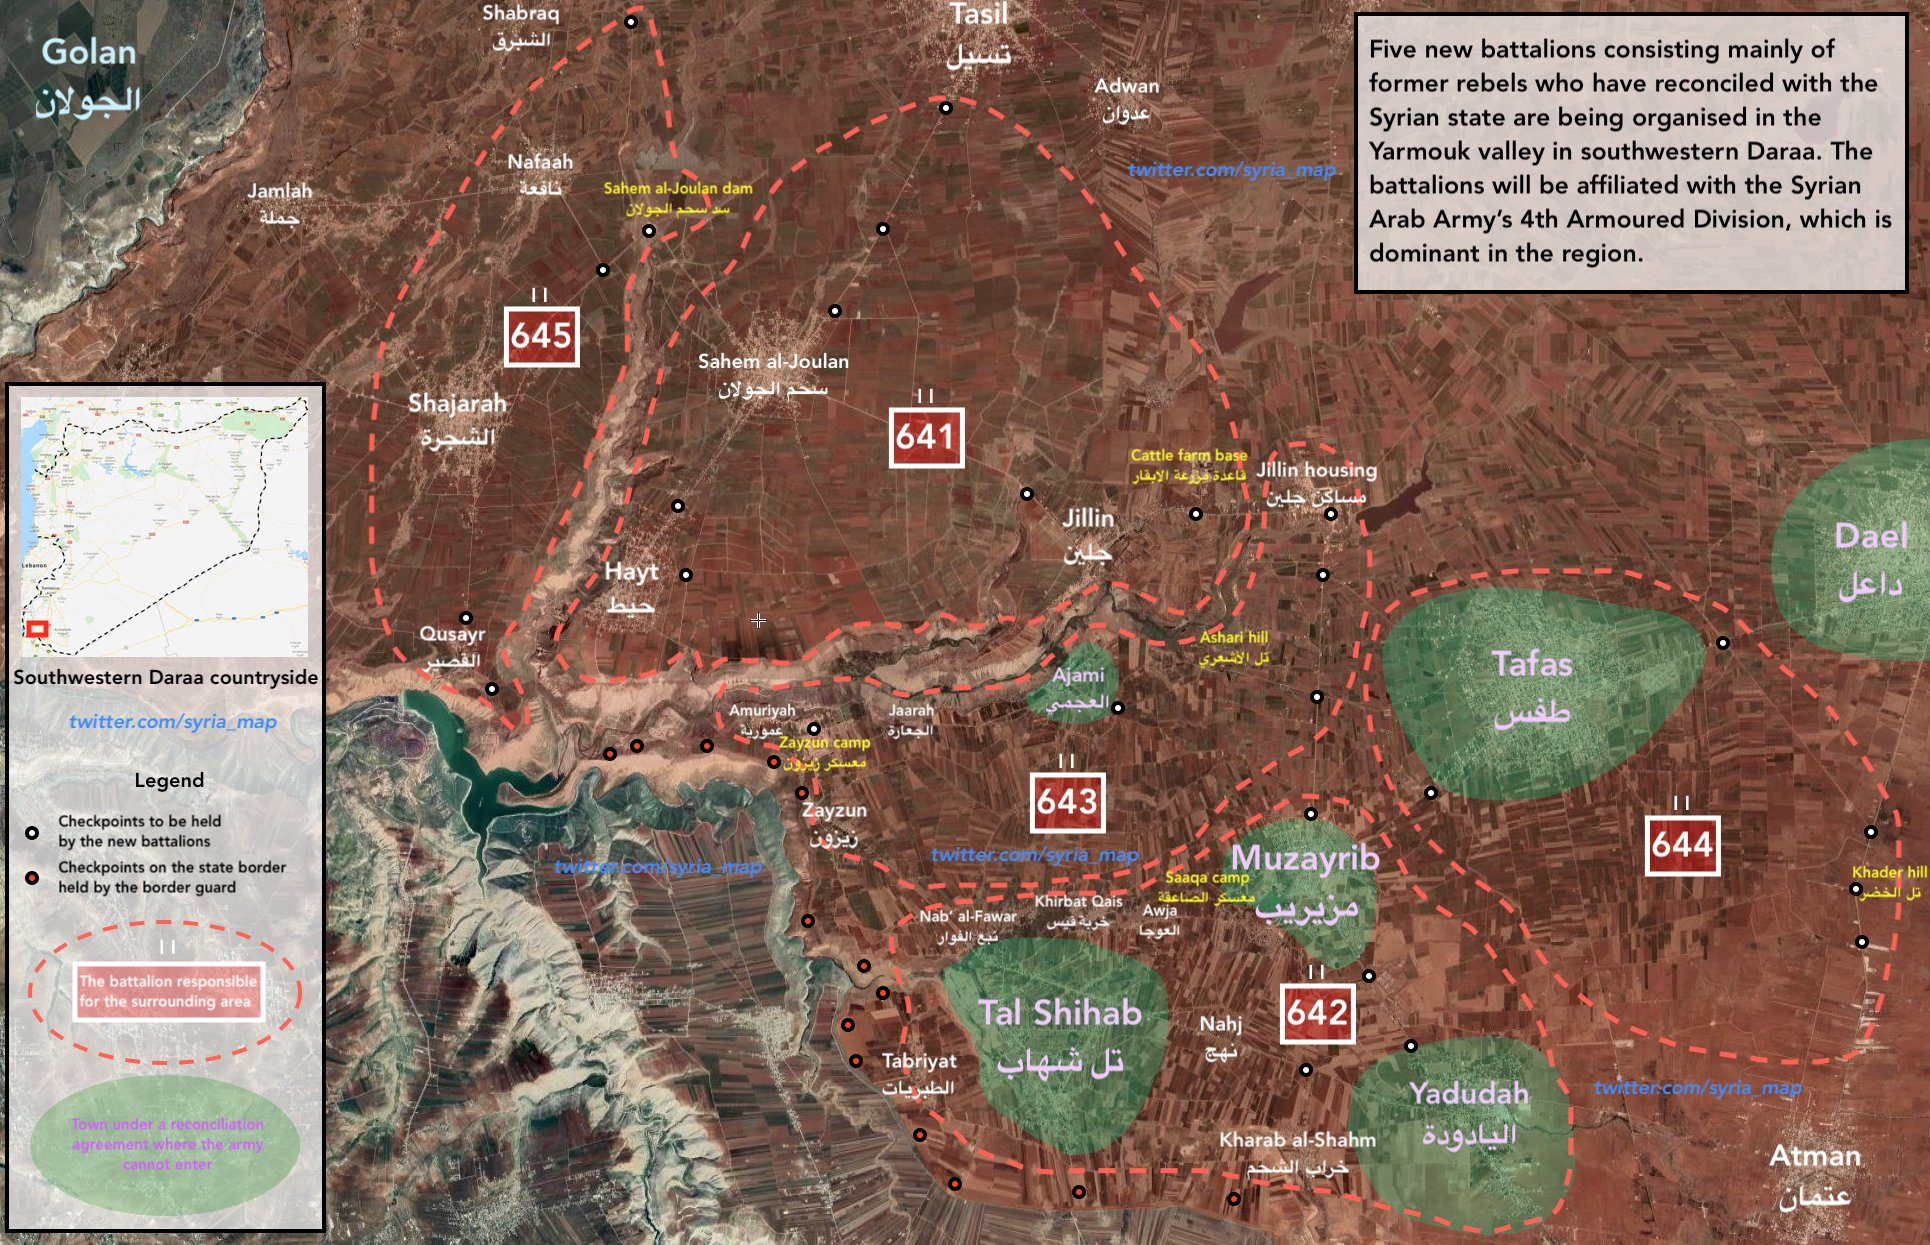 Syrian War: News #22 - Page 10 EbrOytmX0AARCKc?format=jpg&name=large